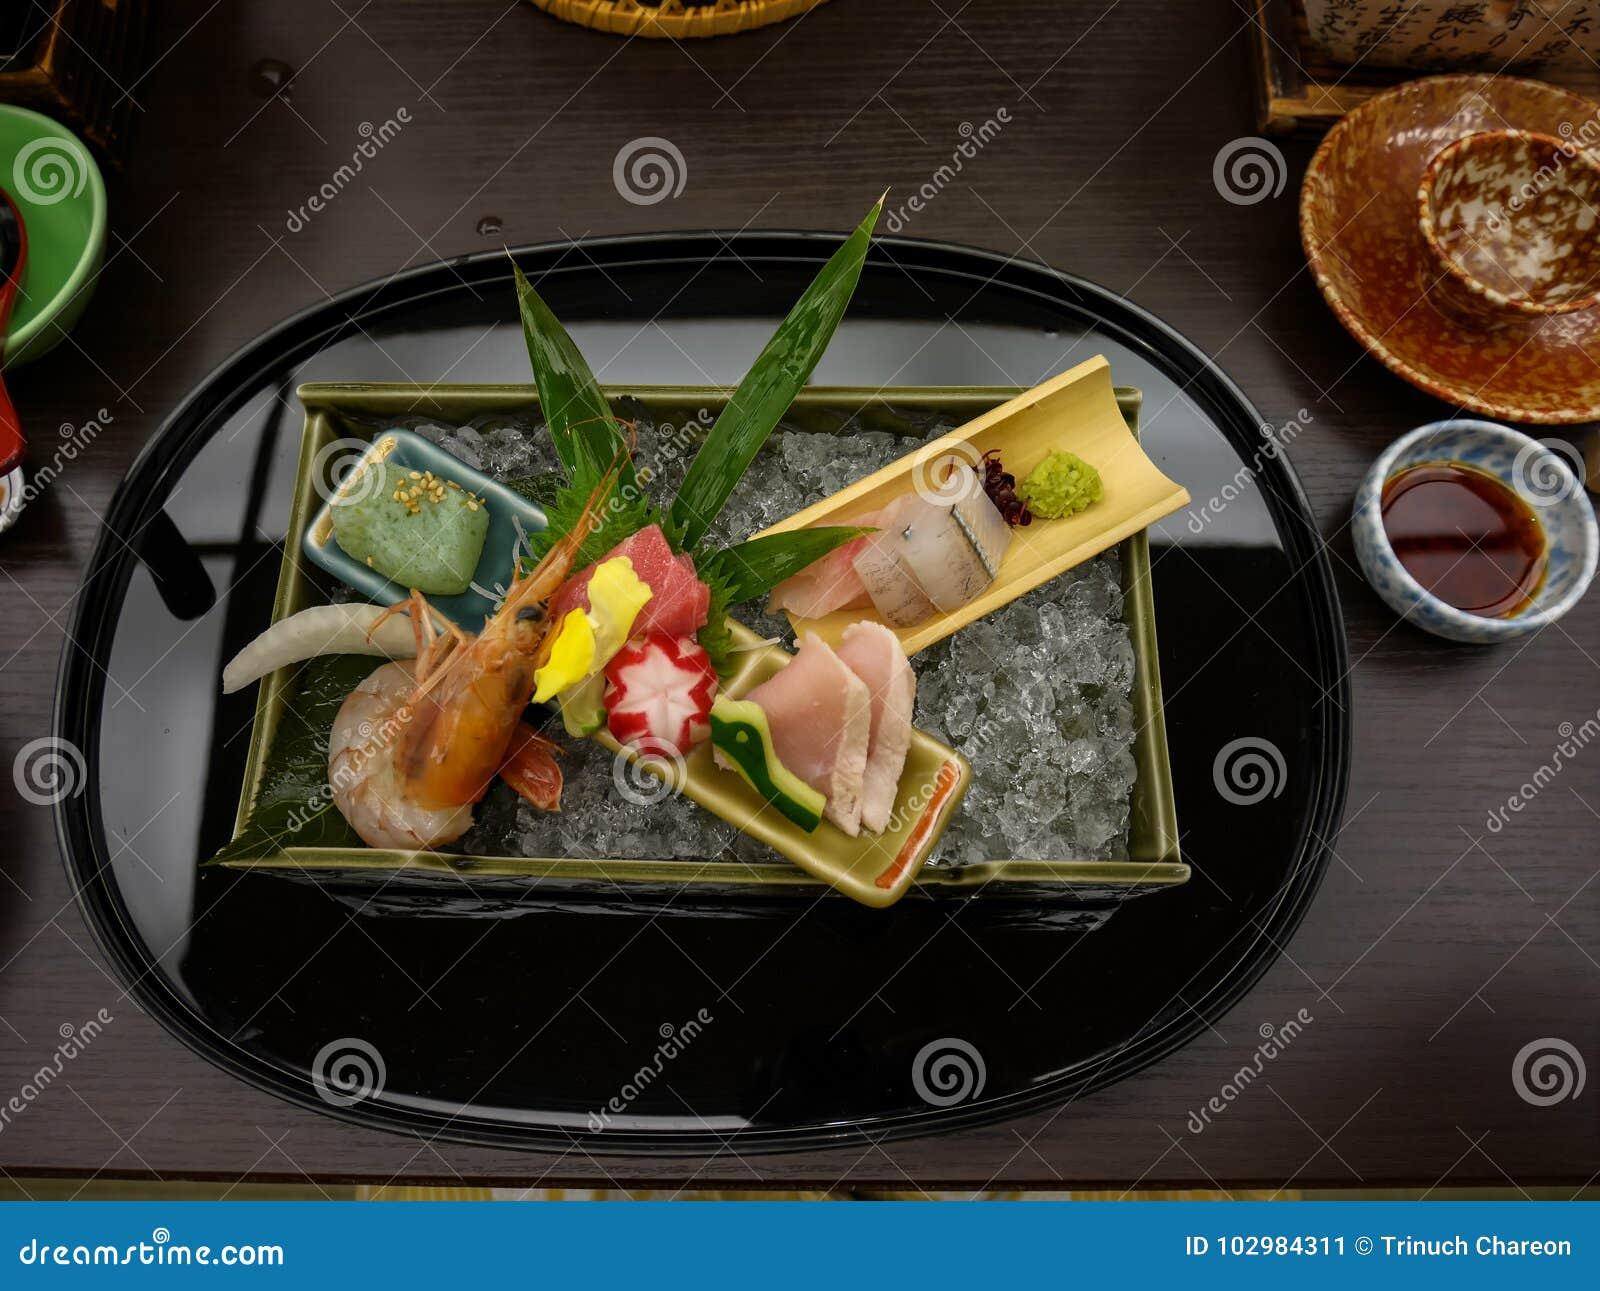 Japanese ryokan kaiseki dinner decorative sashimi set including Pacific blue fin tuna, shrimp, greater amberjack, halfbeak